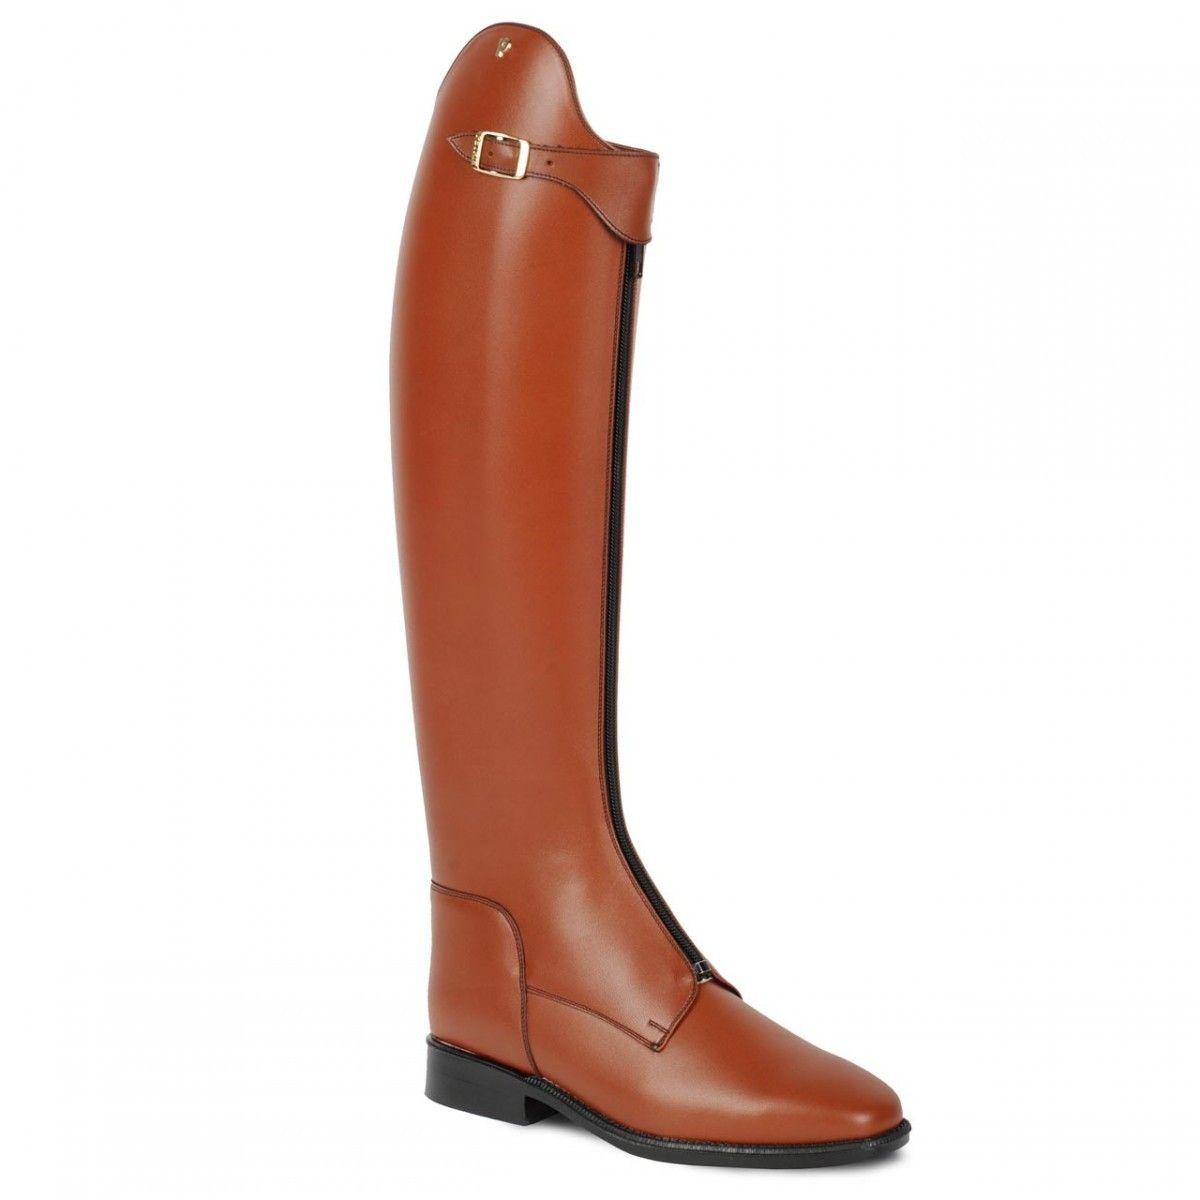 Petrie Athene rijlaars | Wishlist Boots, Riding Boots en Shoes